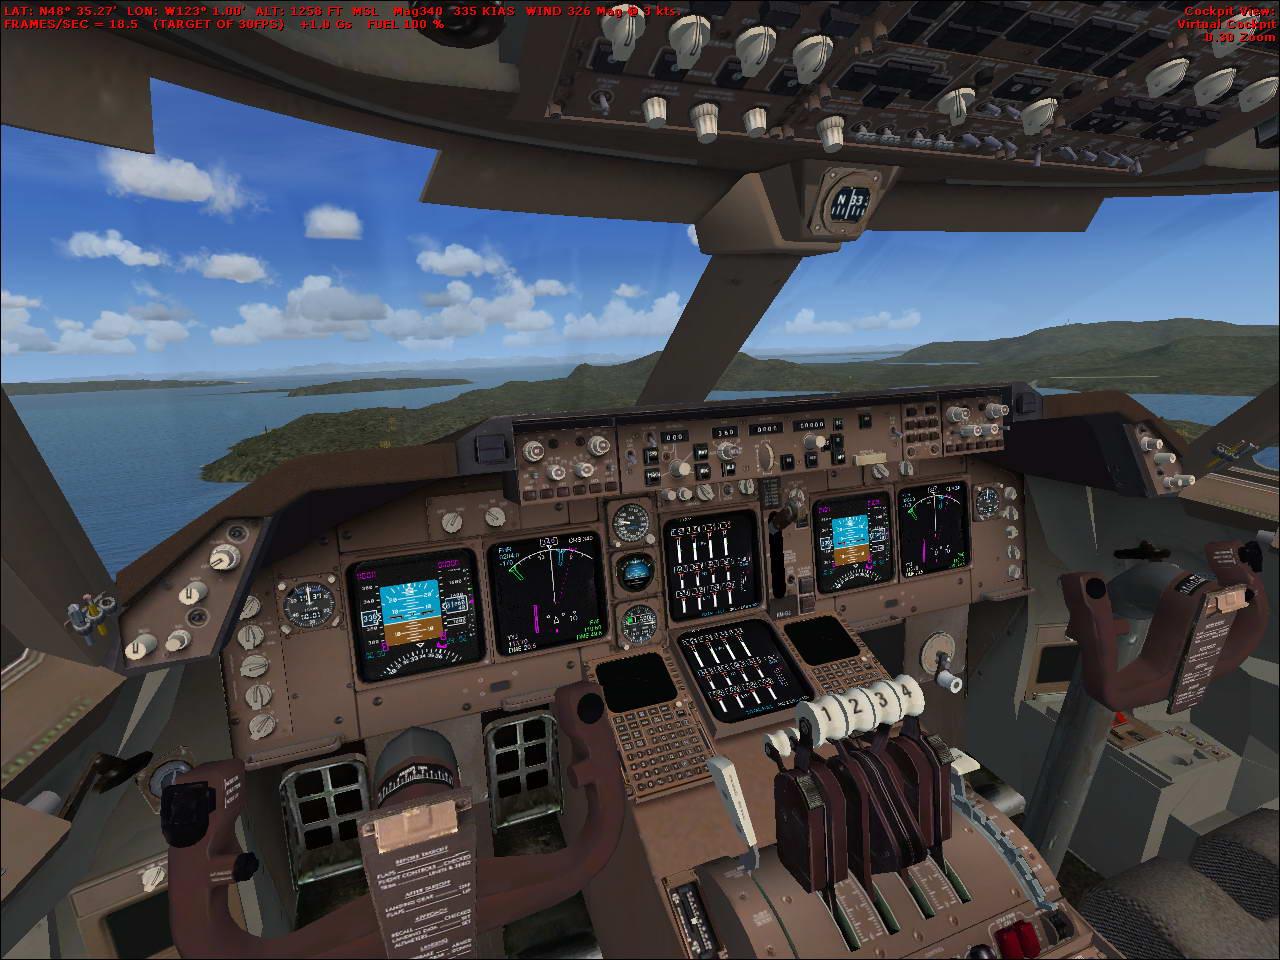 ... Flight Simulator X video game wallpapers • Wallpaper 75 of 83